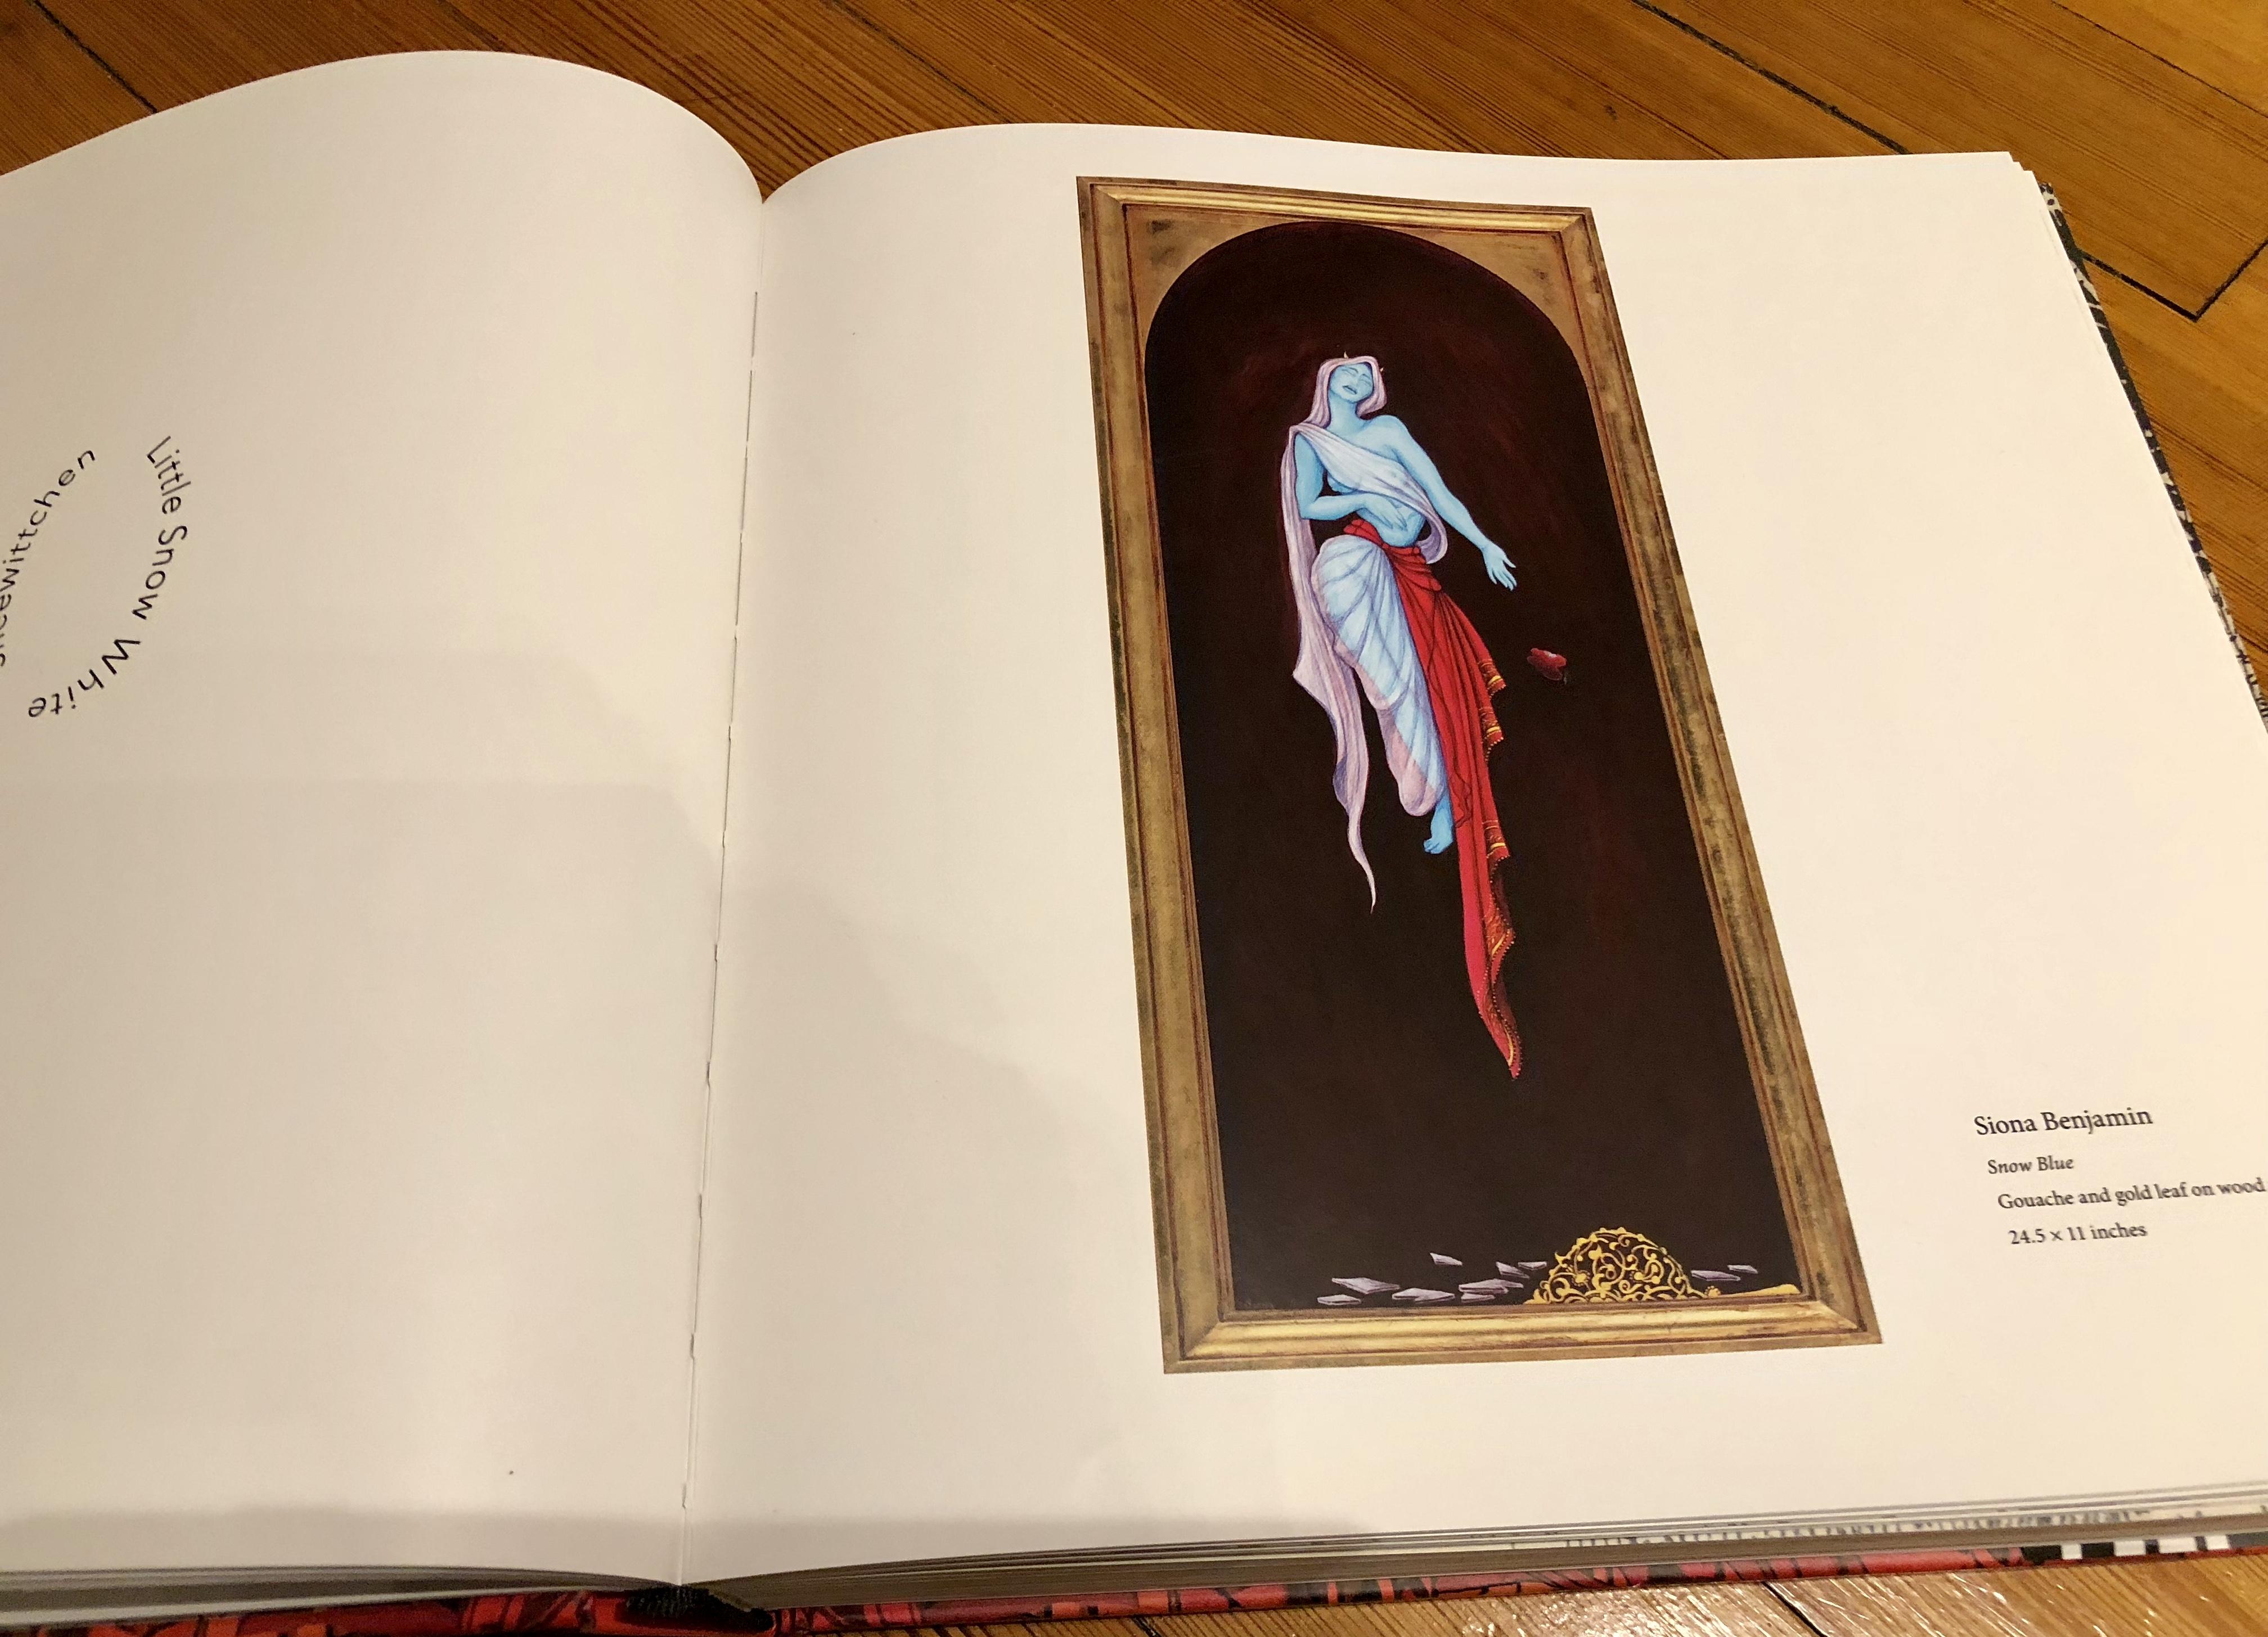 Mirrored Book Snow Blue - open